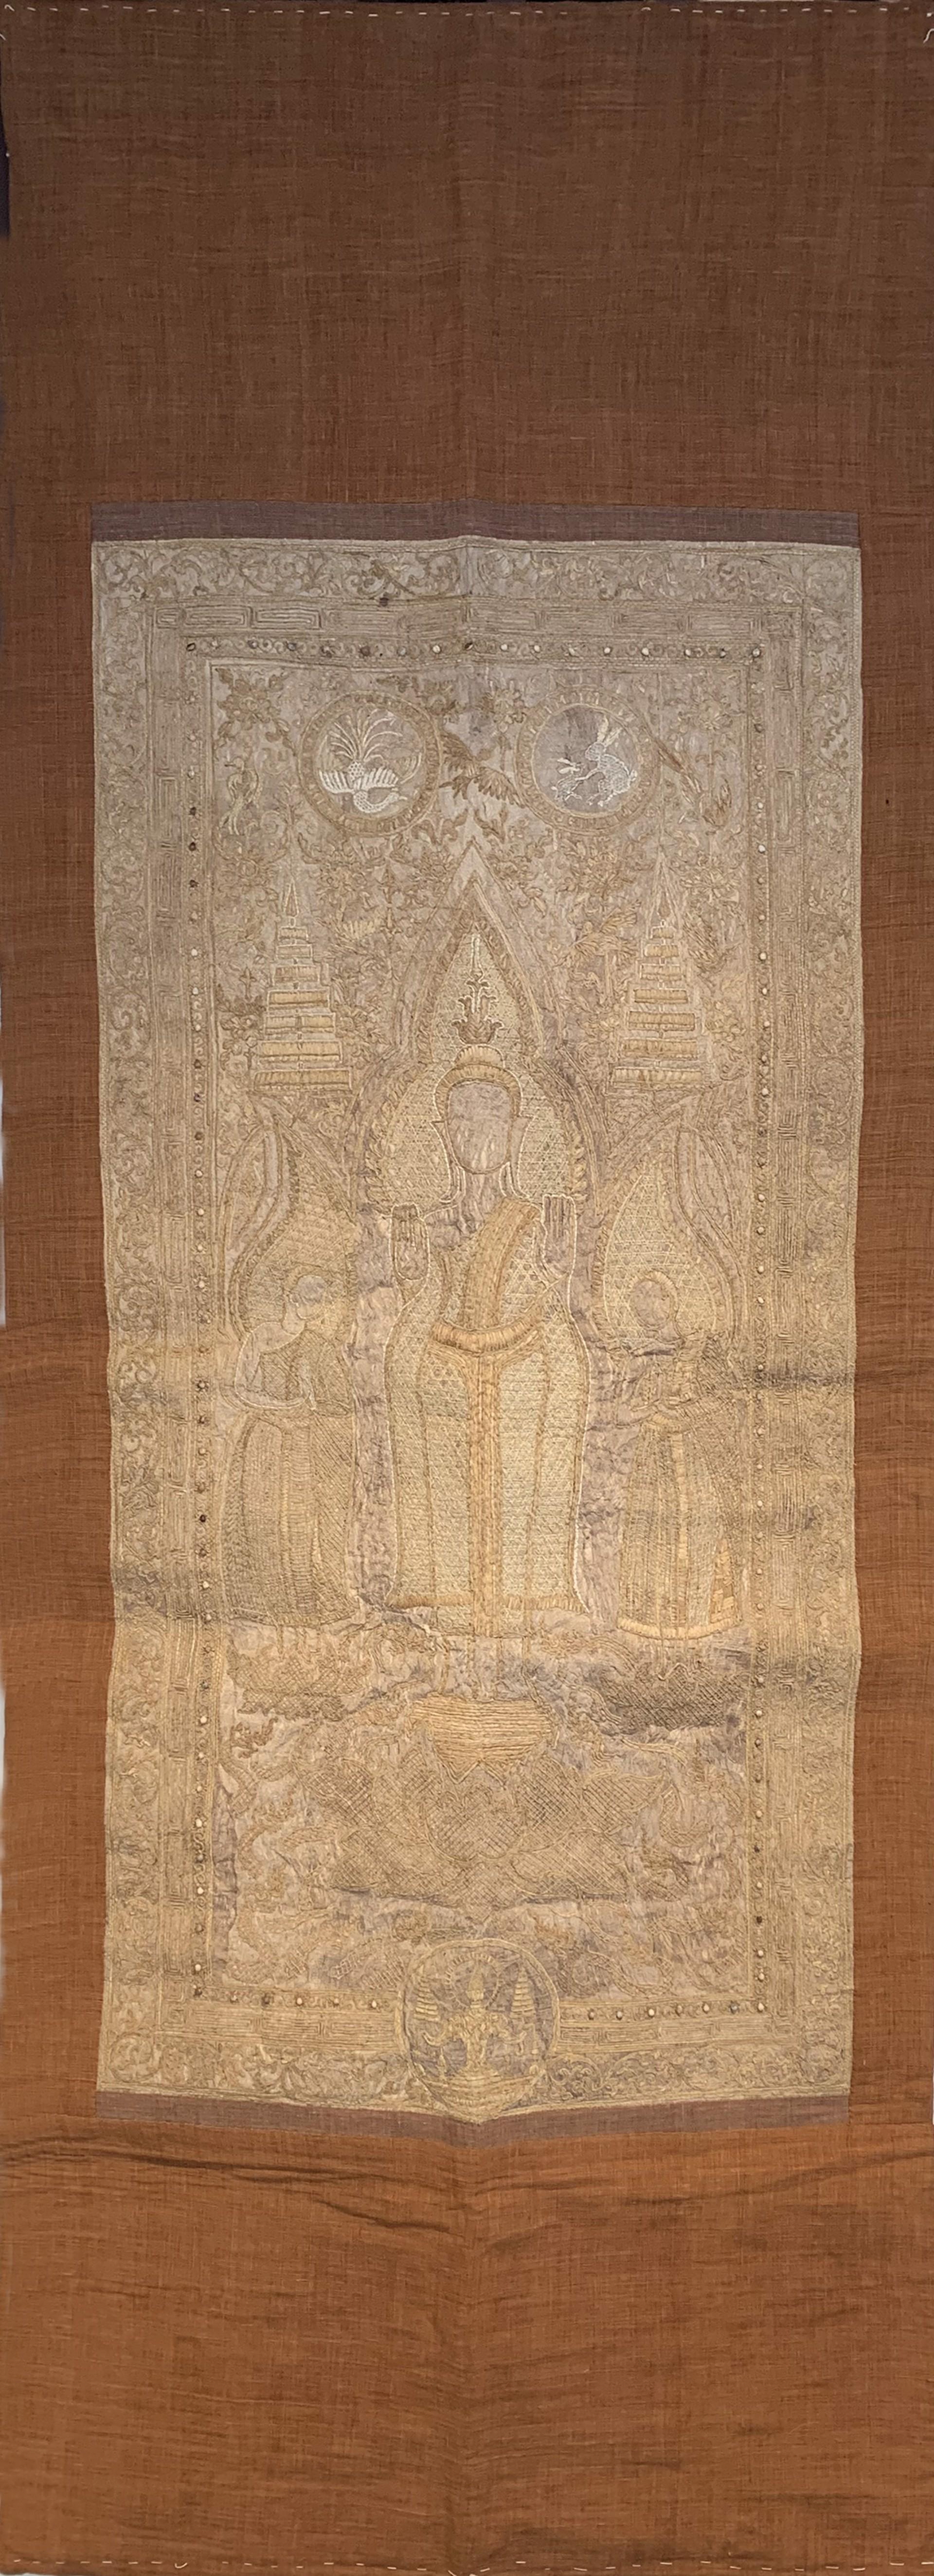 Pha Phabot Tantra Screen by Tiao Nithakhong Somsanith